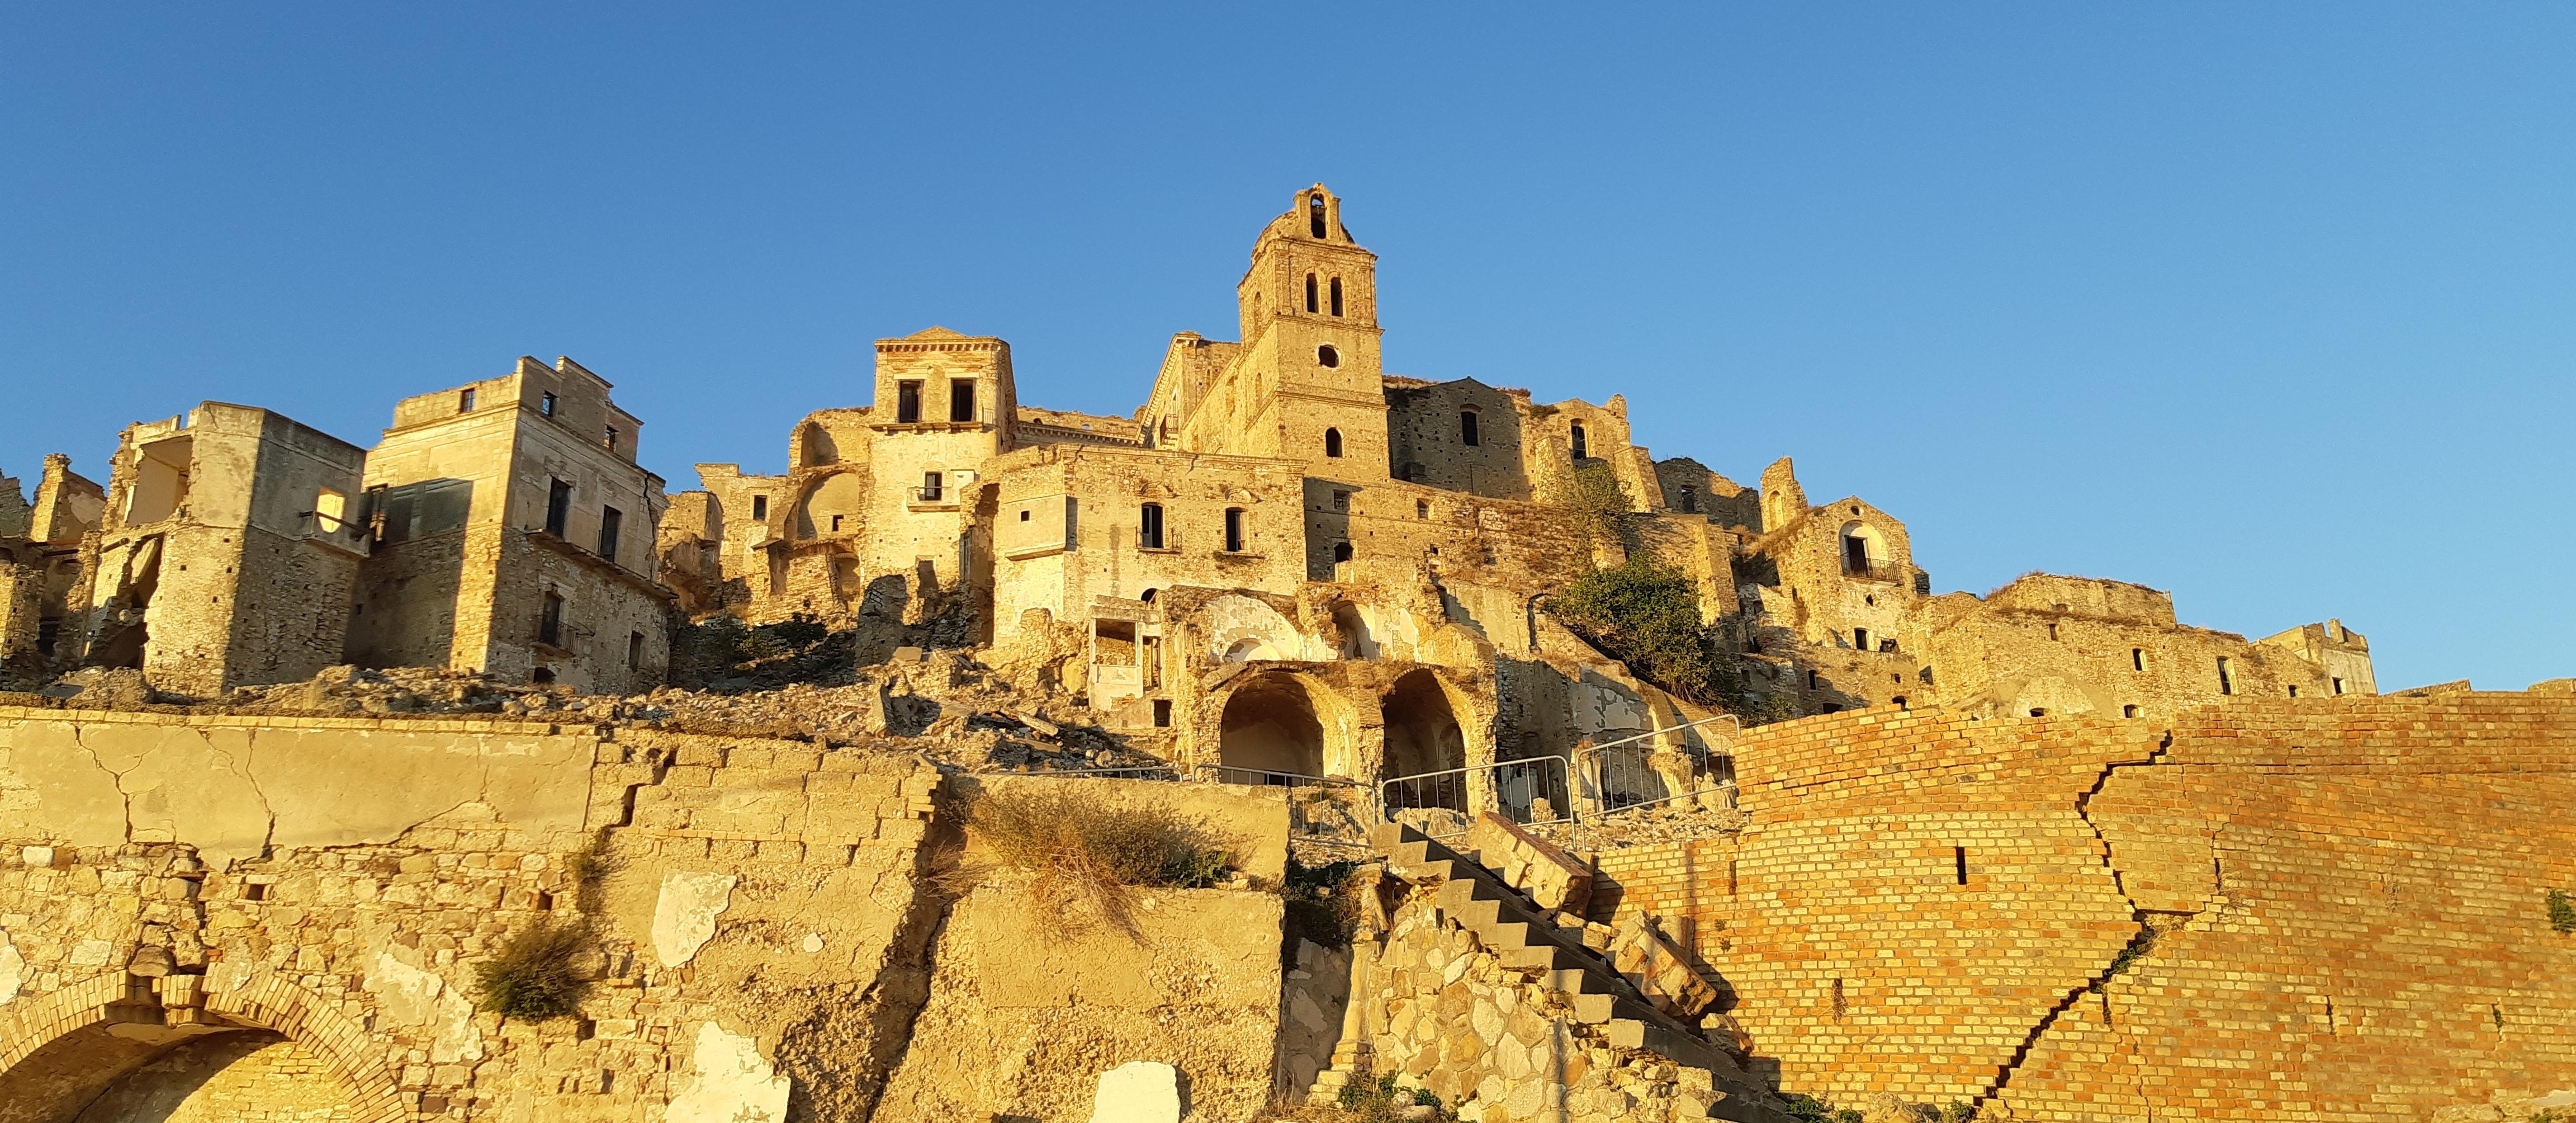 il paese fantasma di Craco in Basilicata